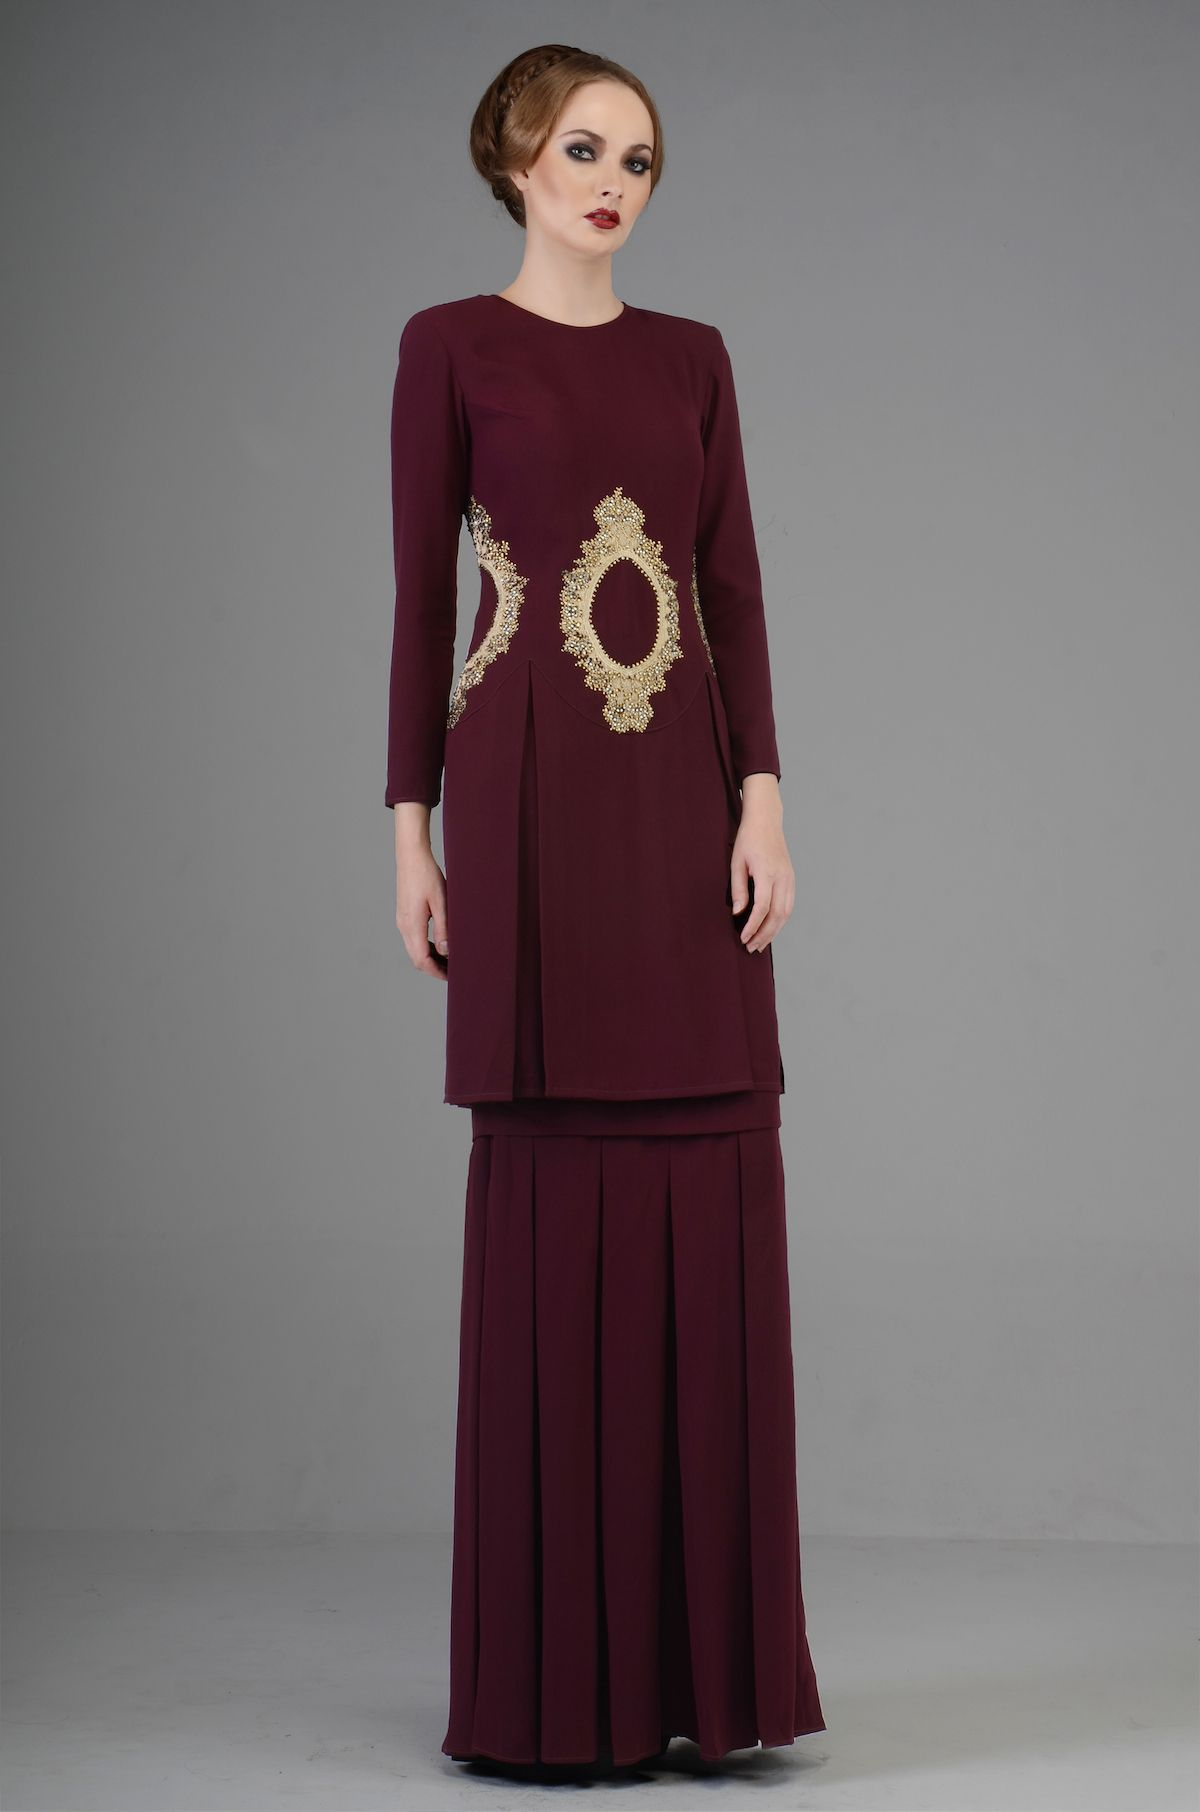 Highness raya look by rizman ruzaini loveit pinterest baju